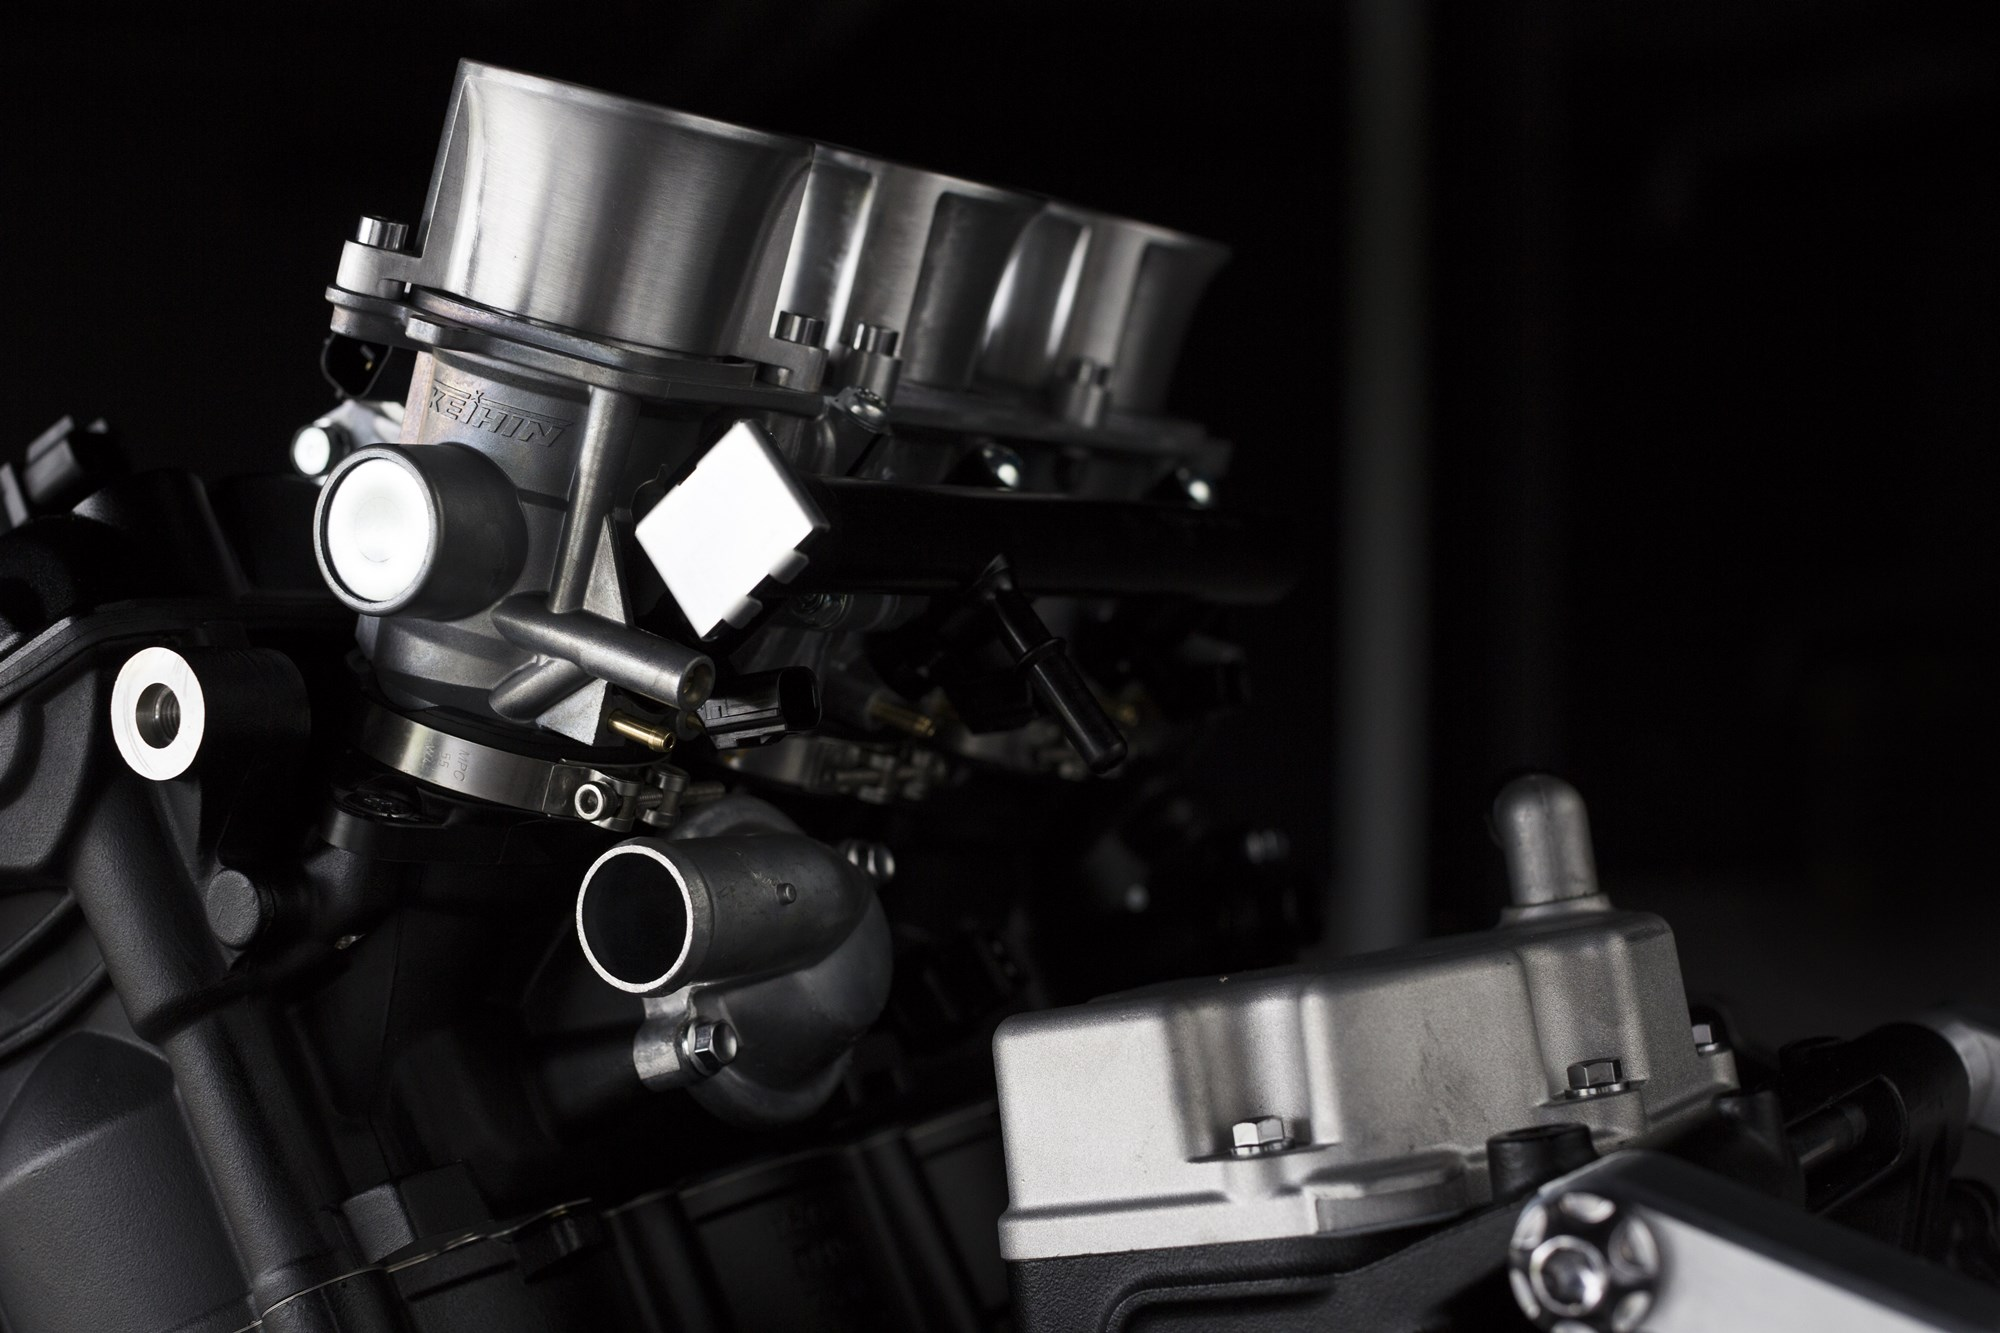 Triumph Moto2 engine